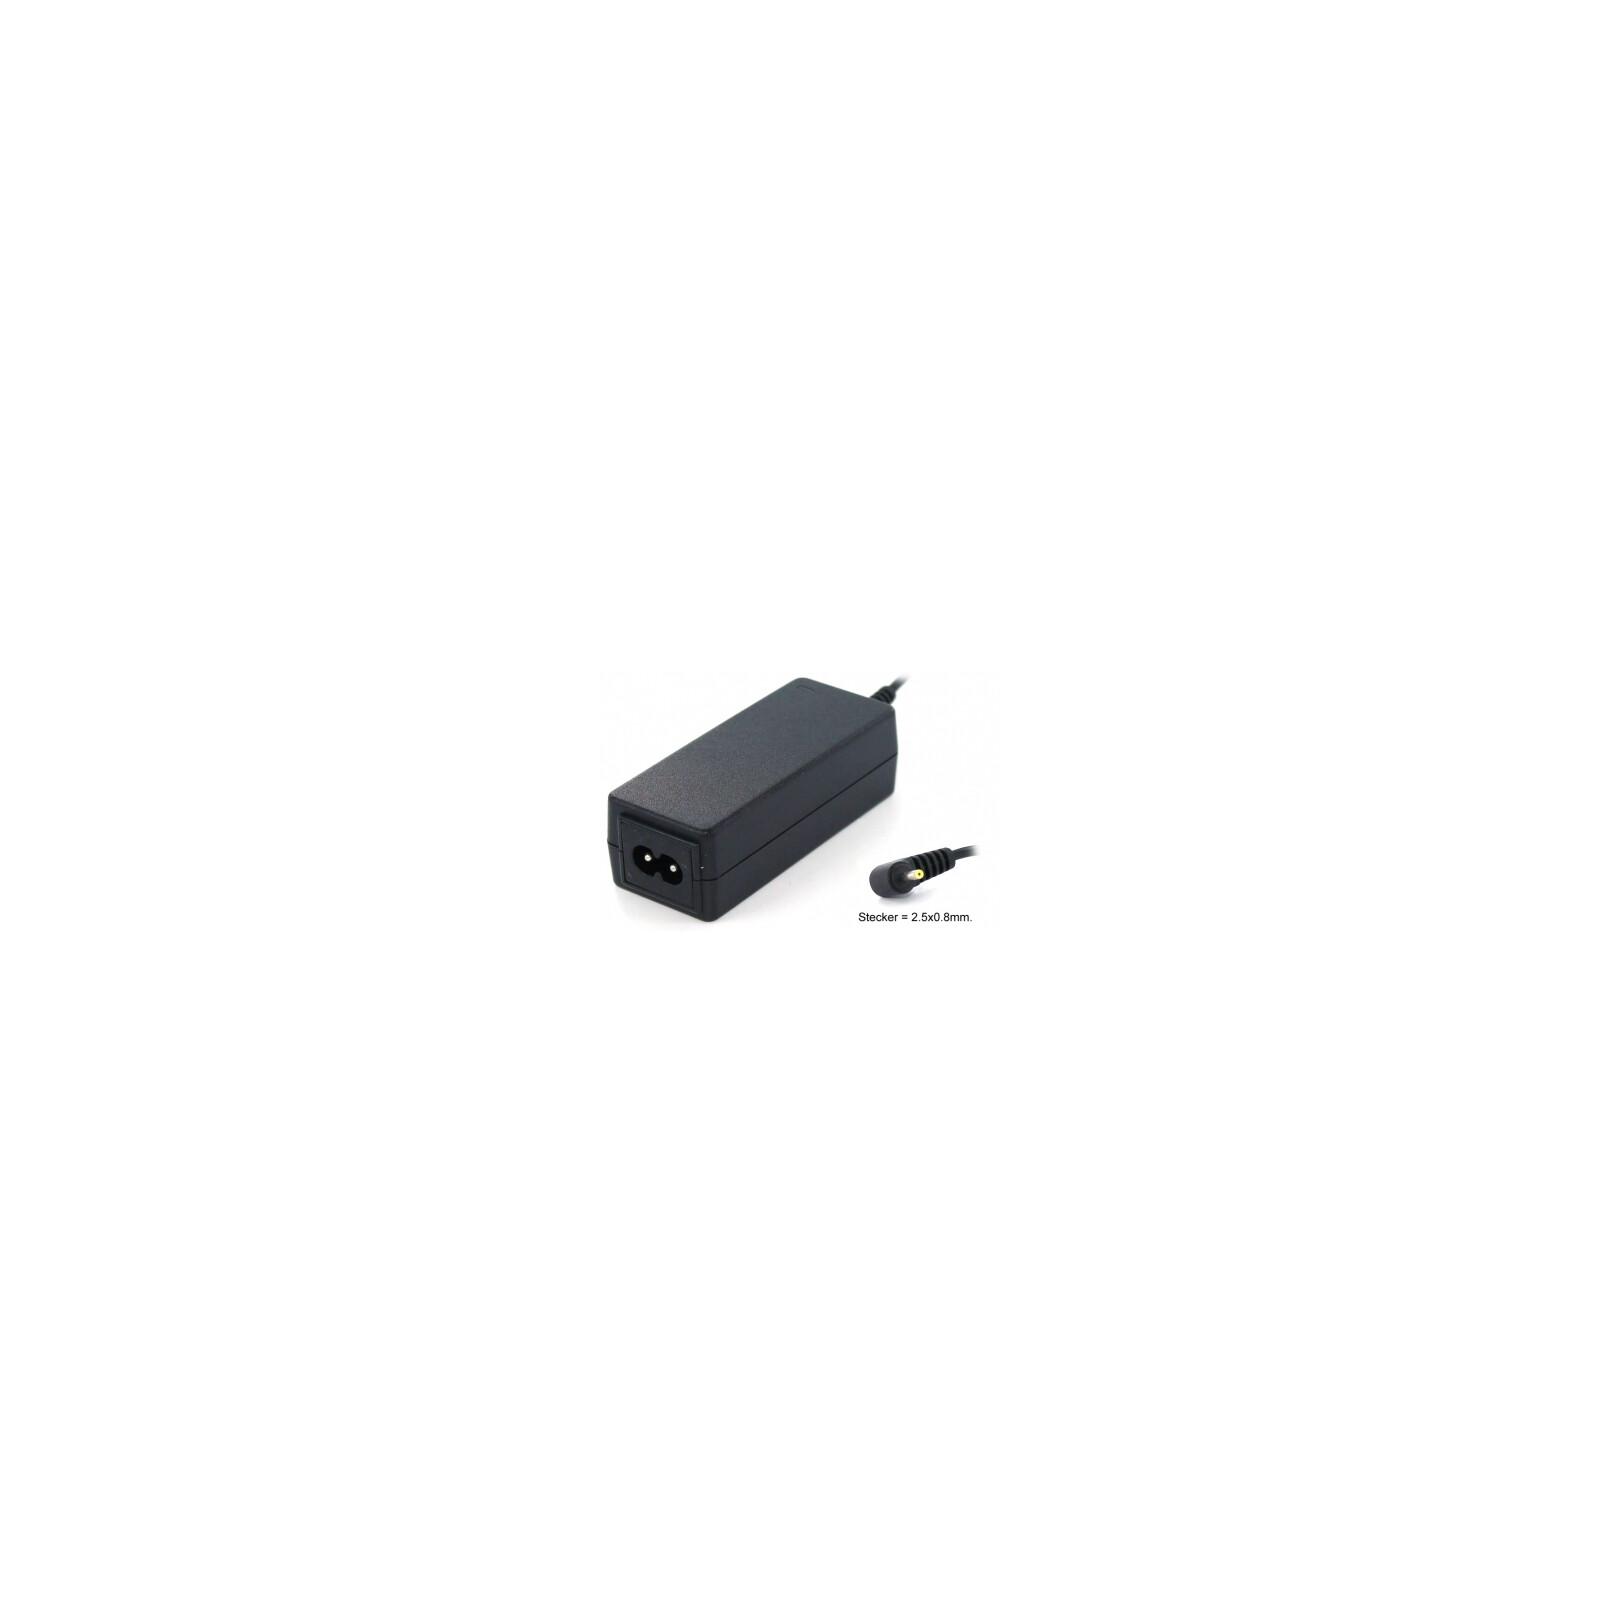 AGI Netzteil Chiligreen Pico N450 40W